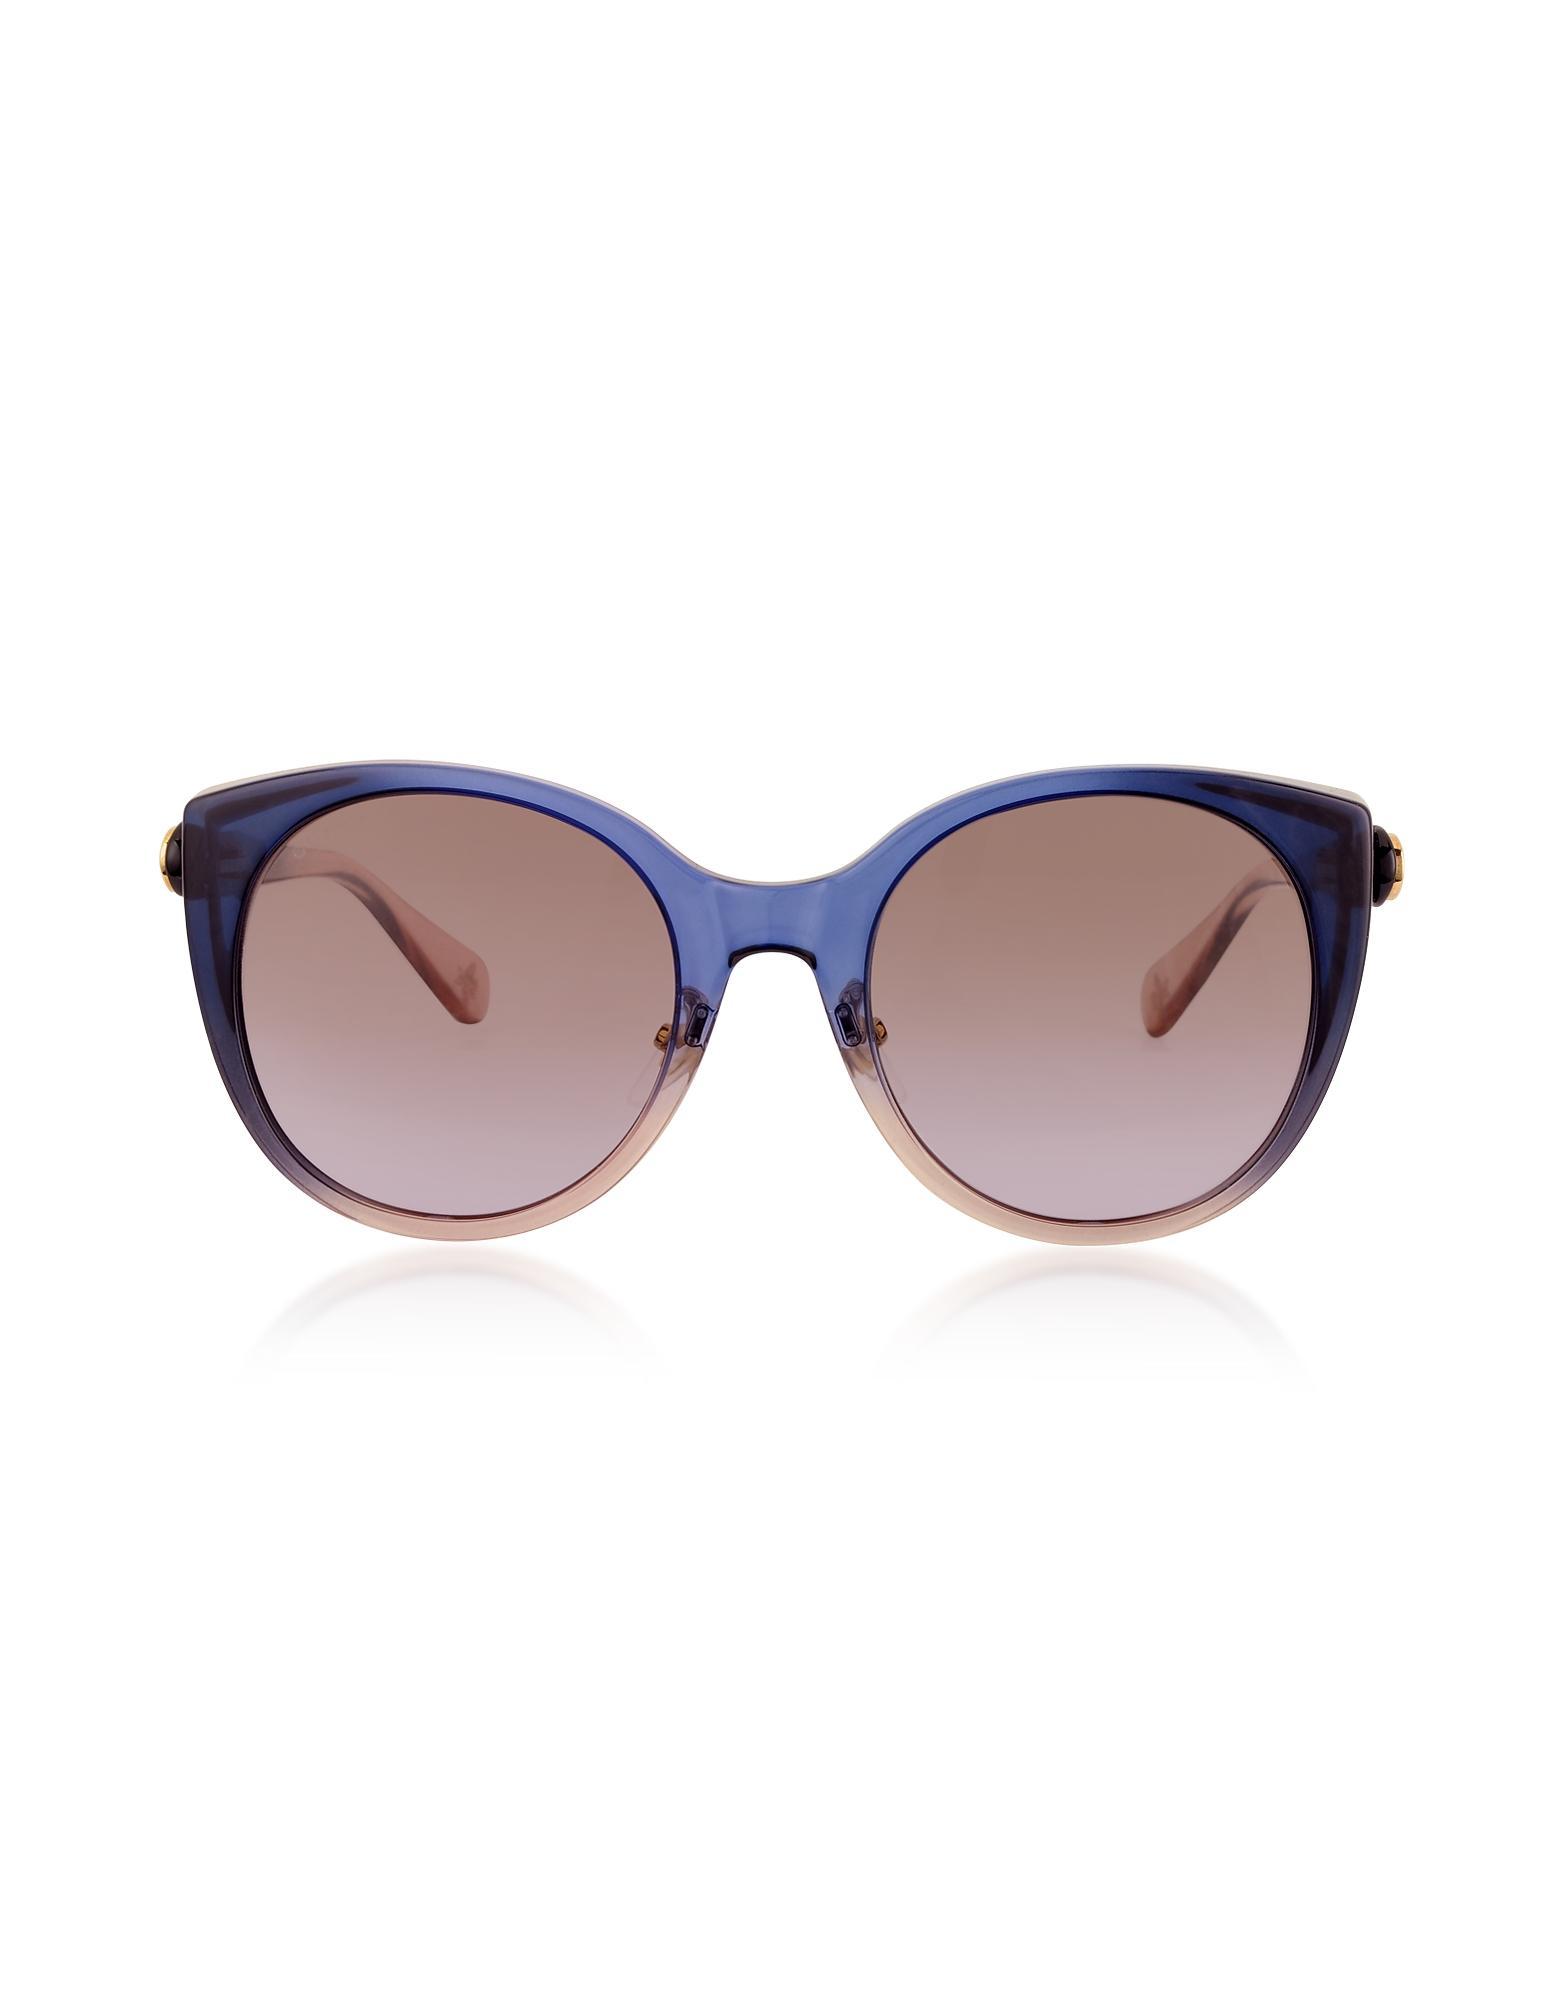 ebf6549fecd03 Gucci. Women s GG0369S Cat-eye Acetate Sunglasses